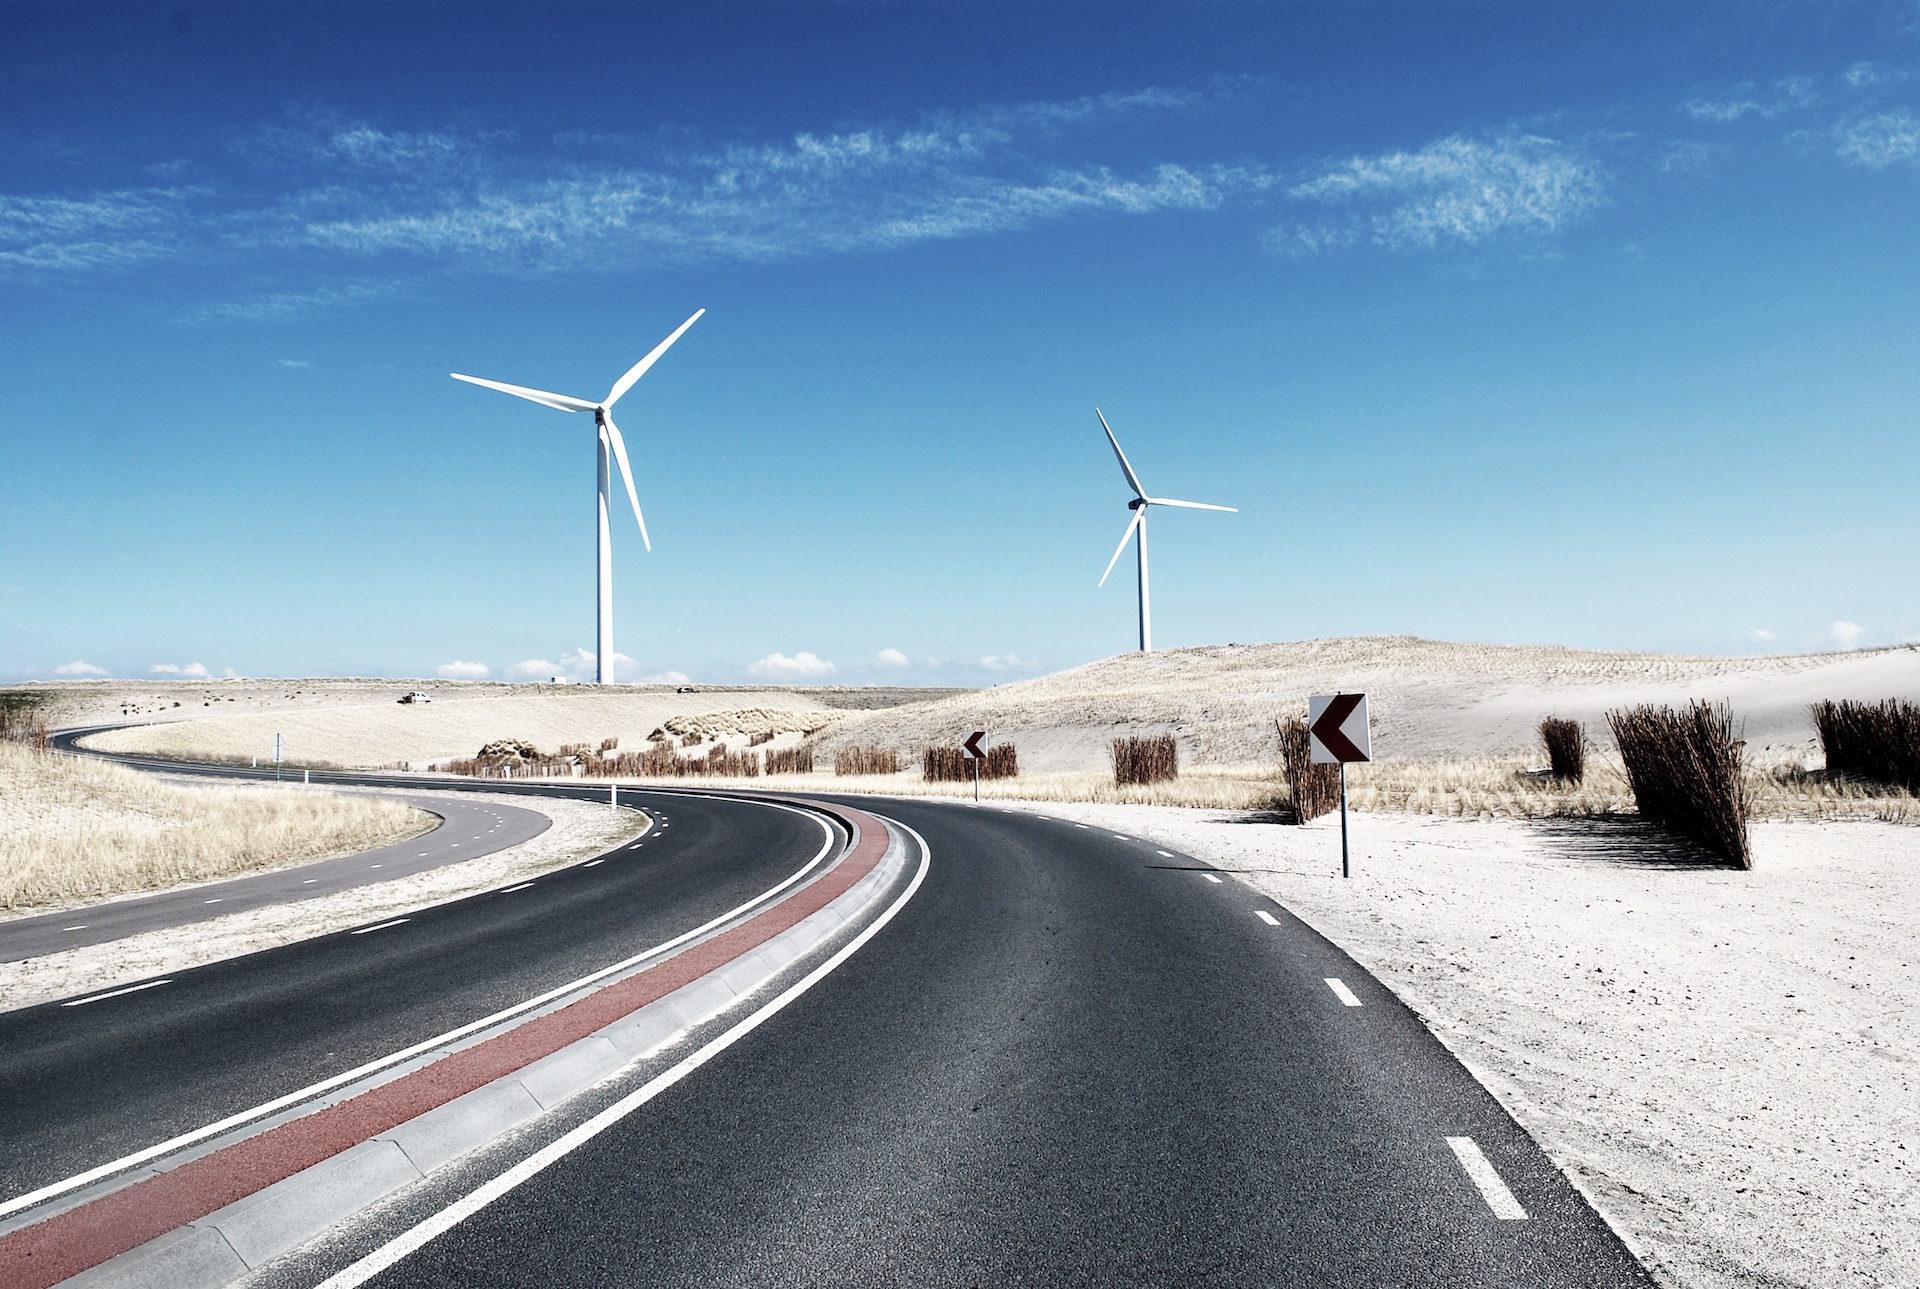 सड़क, मिल्स, पवन, विंड फार्म, आकाश - HD वॉलपेपर - प्रोफेसर-falken.com